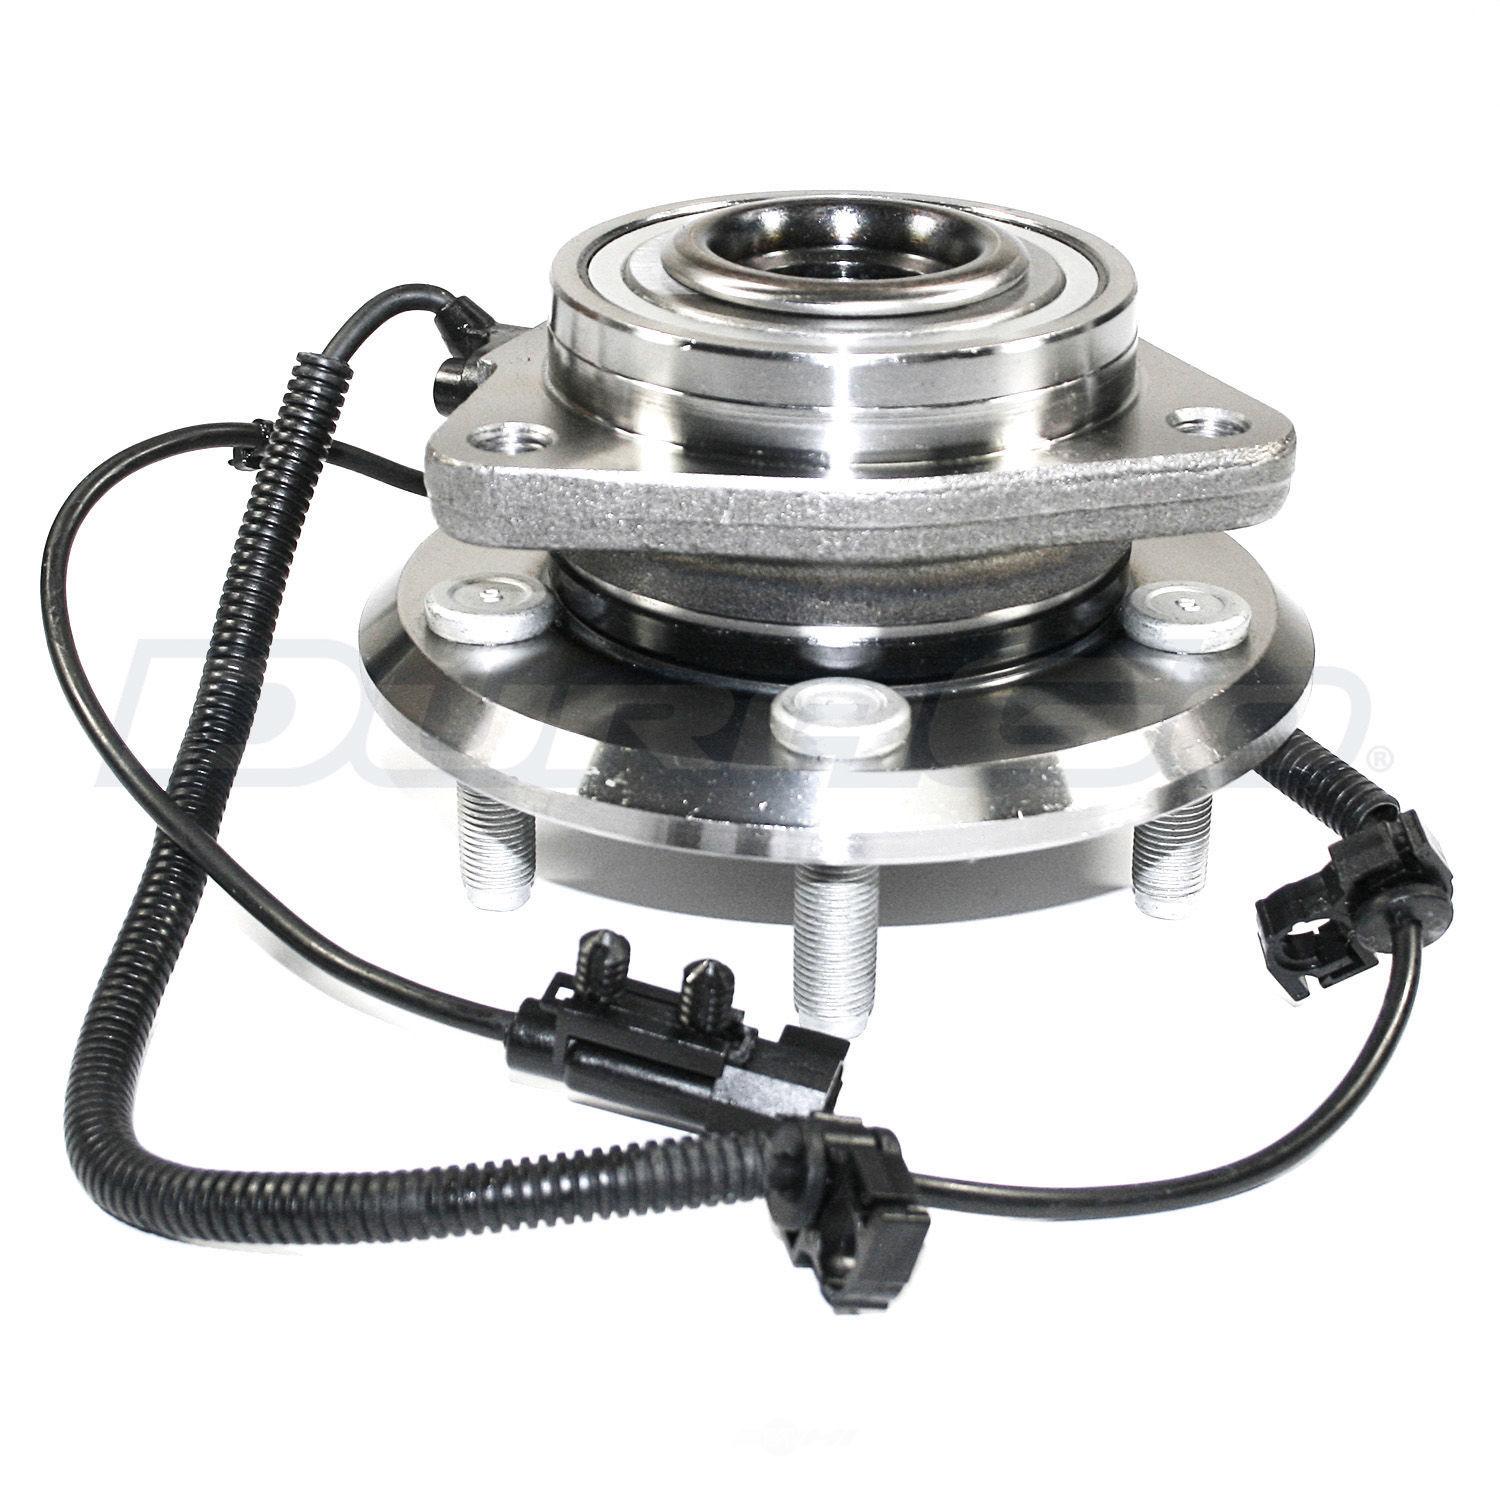 DURAGO - Wheel Bearing & Hub Assembly (Front) - D48 295-13270